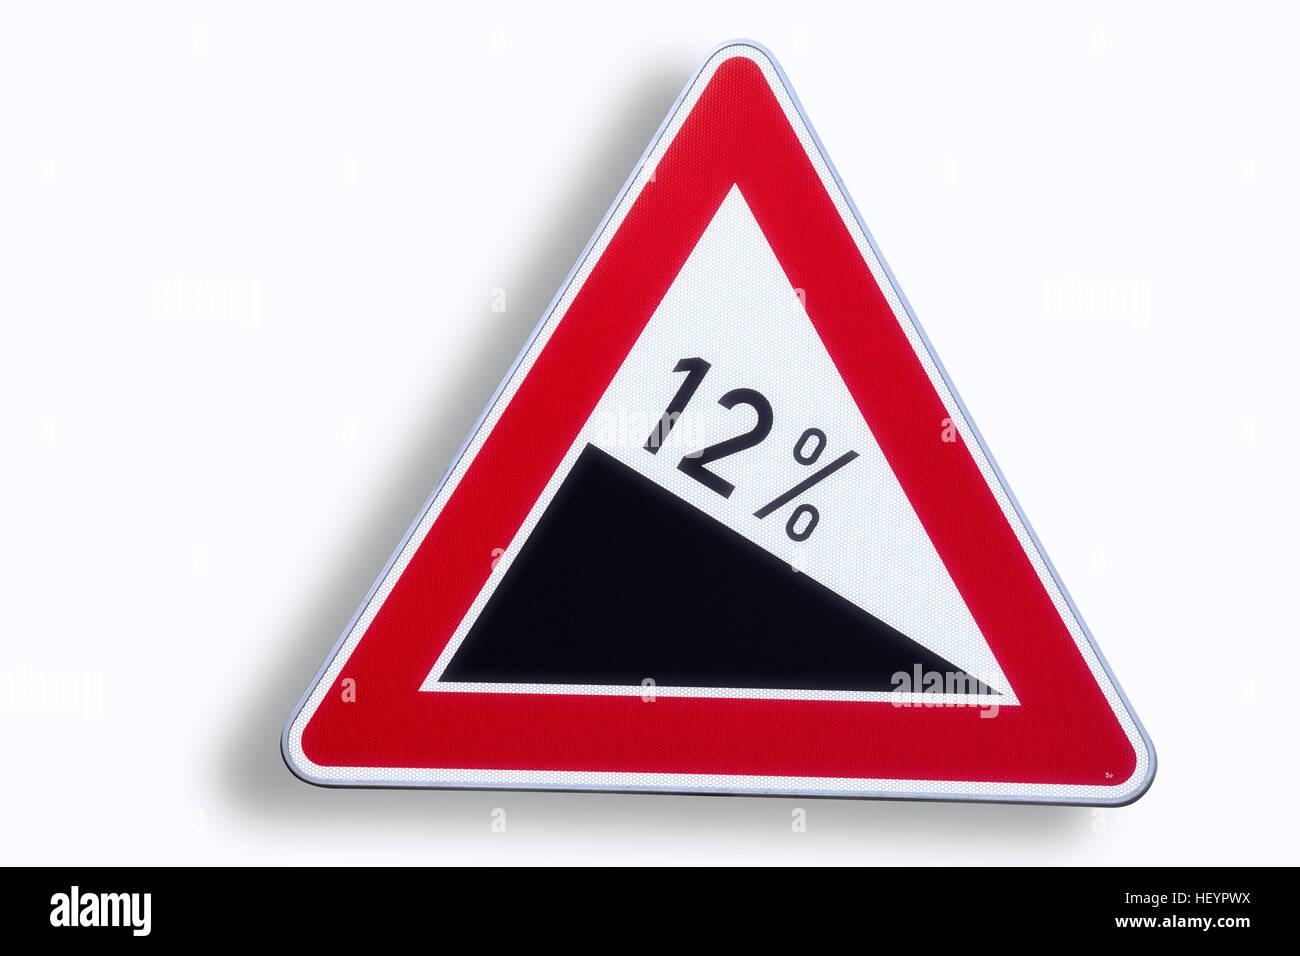 Road sign, warning, 12% gradient - Stock Image